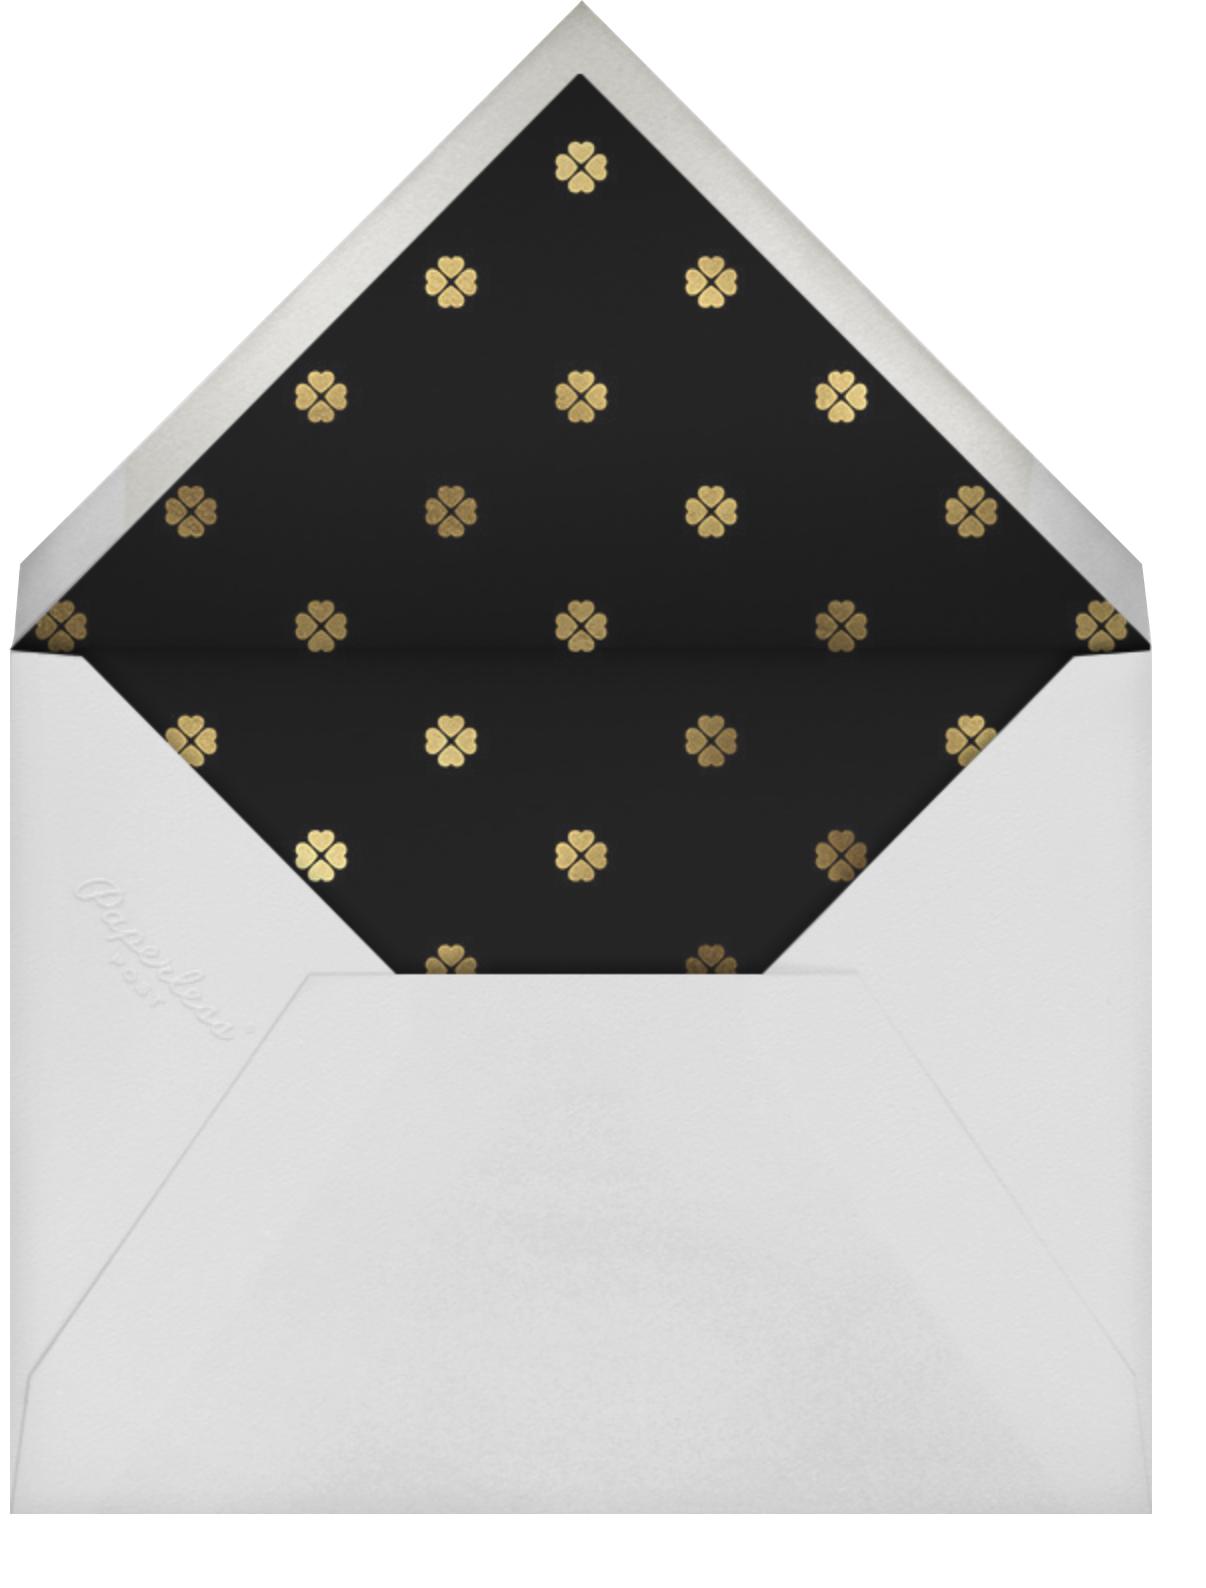 Grand Flora - Black - kate spade new york - General entertaining - envelope back